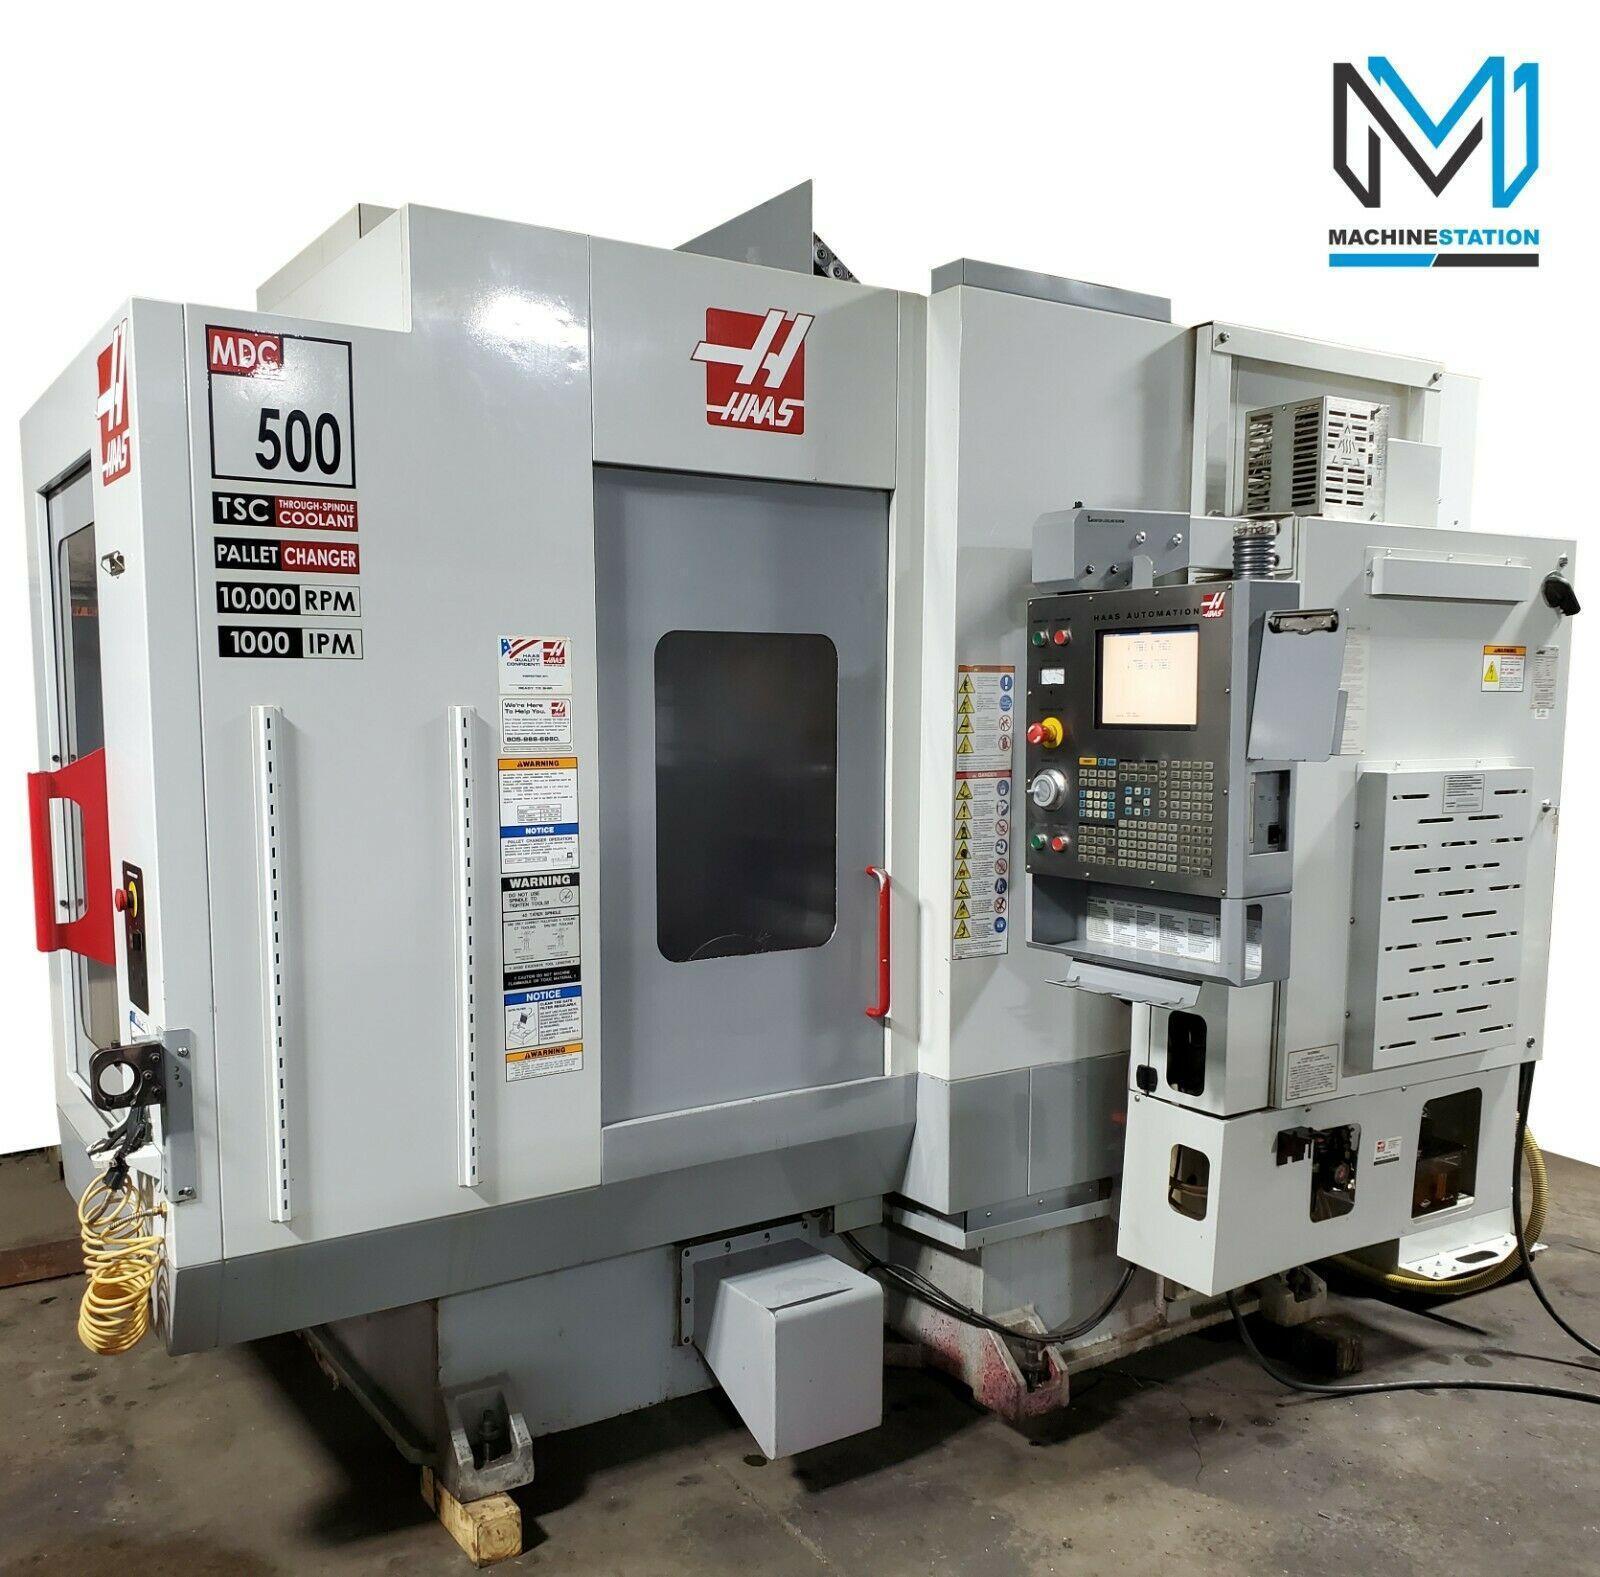 HAAS MDC-500 VERTICAL MILL DRILL MACHINING CENTER CNC MILL